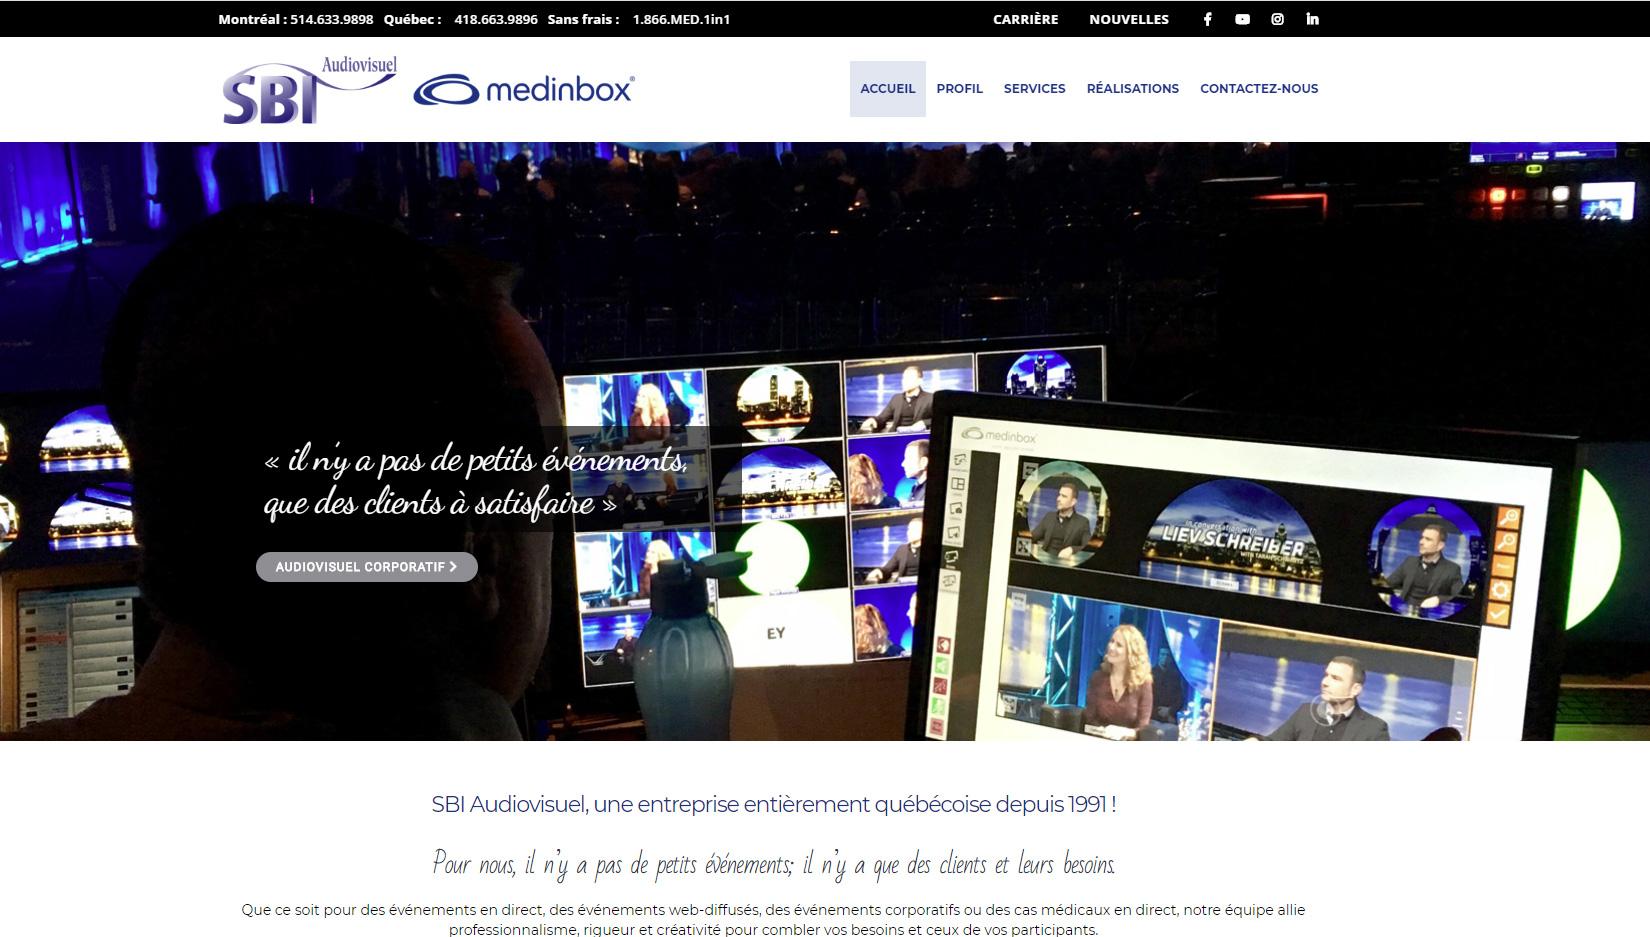 sbi-audiovisl-medinbox